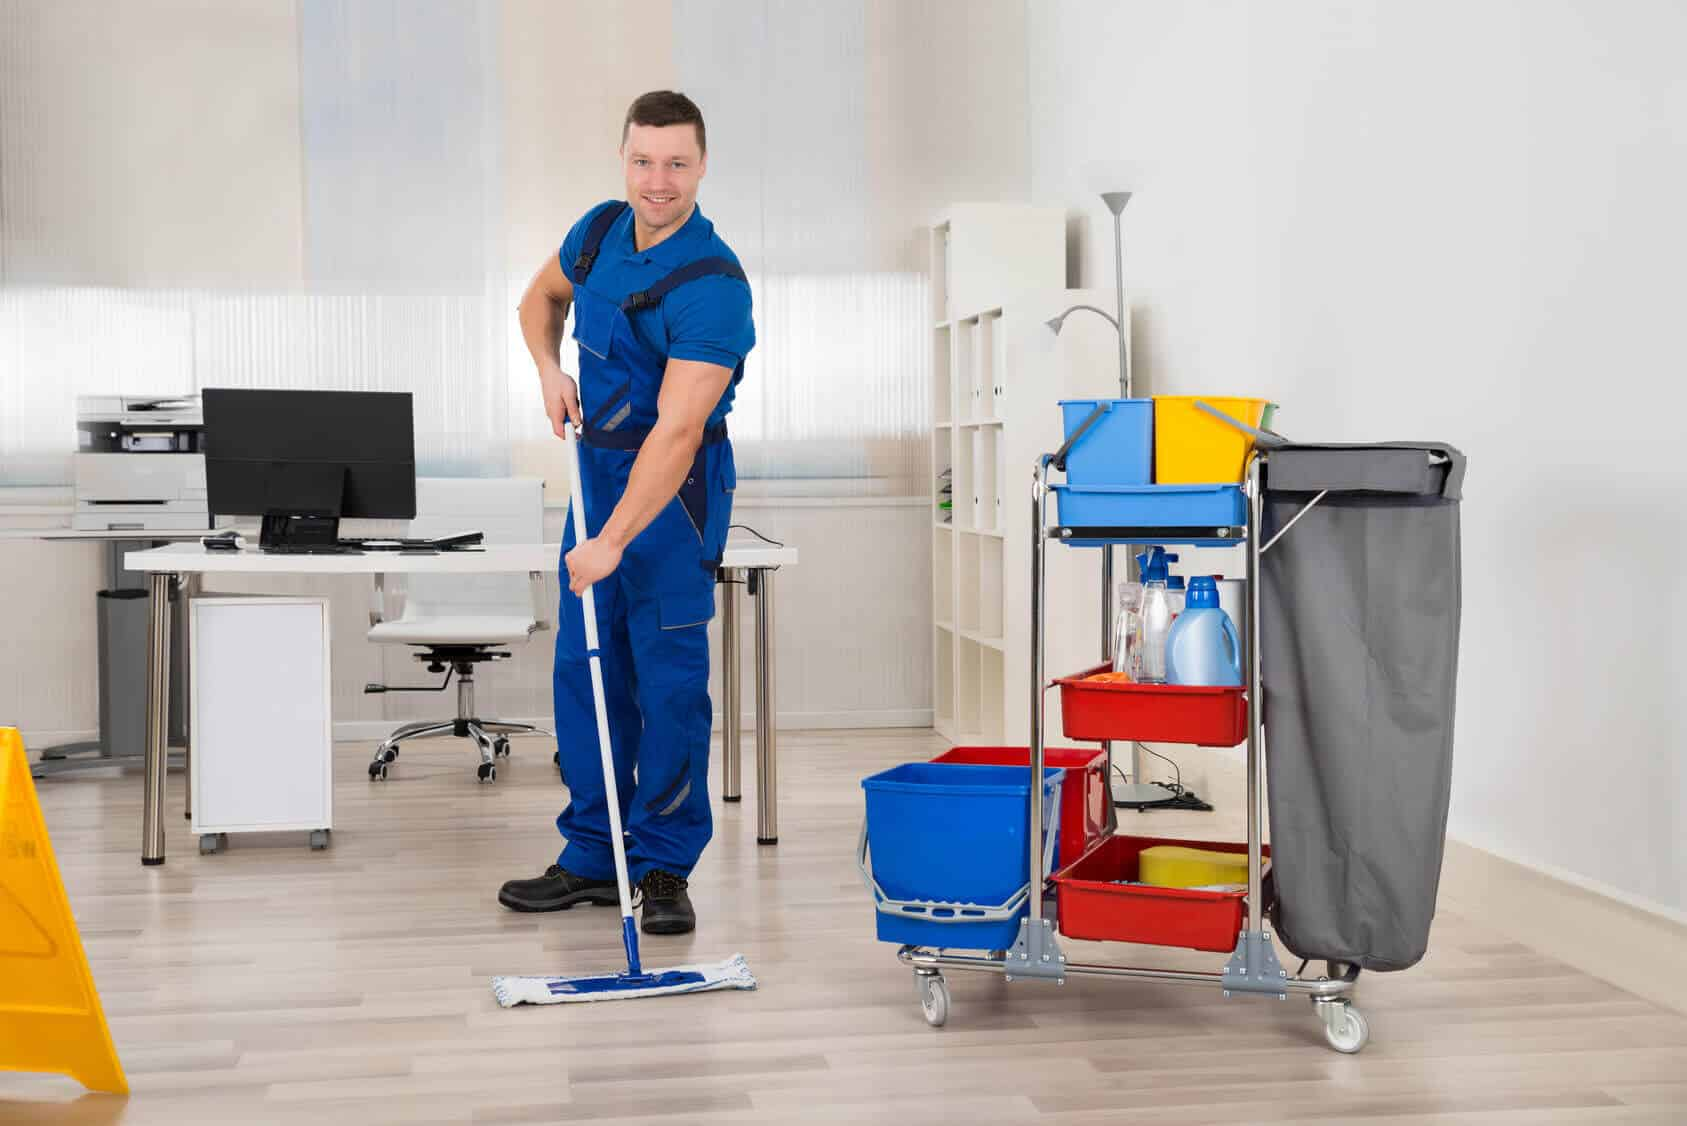 Reinigungsfirma Berlin